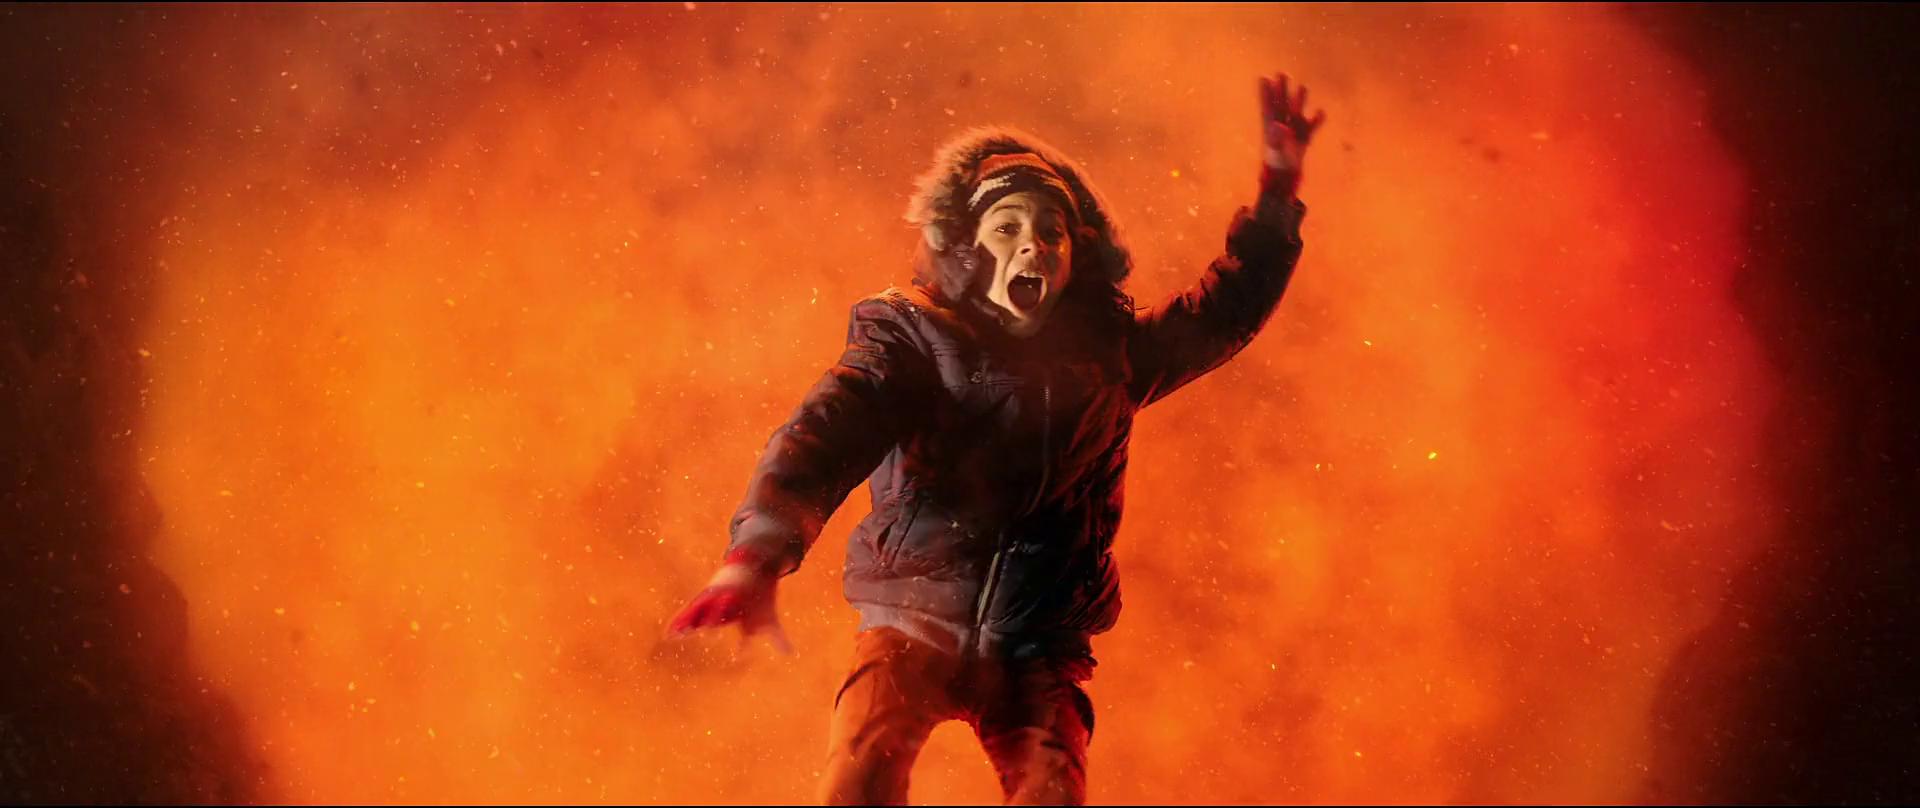 Krampus (2015) Full Movie Free Download And Watch Online In HD brrip bluray dvdrip 300mb 700mb 1gb